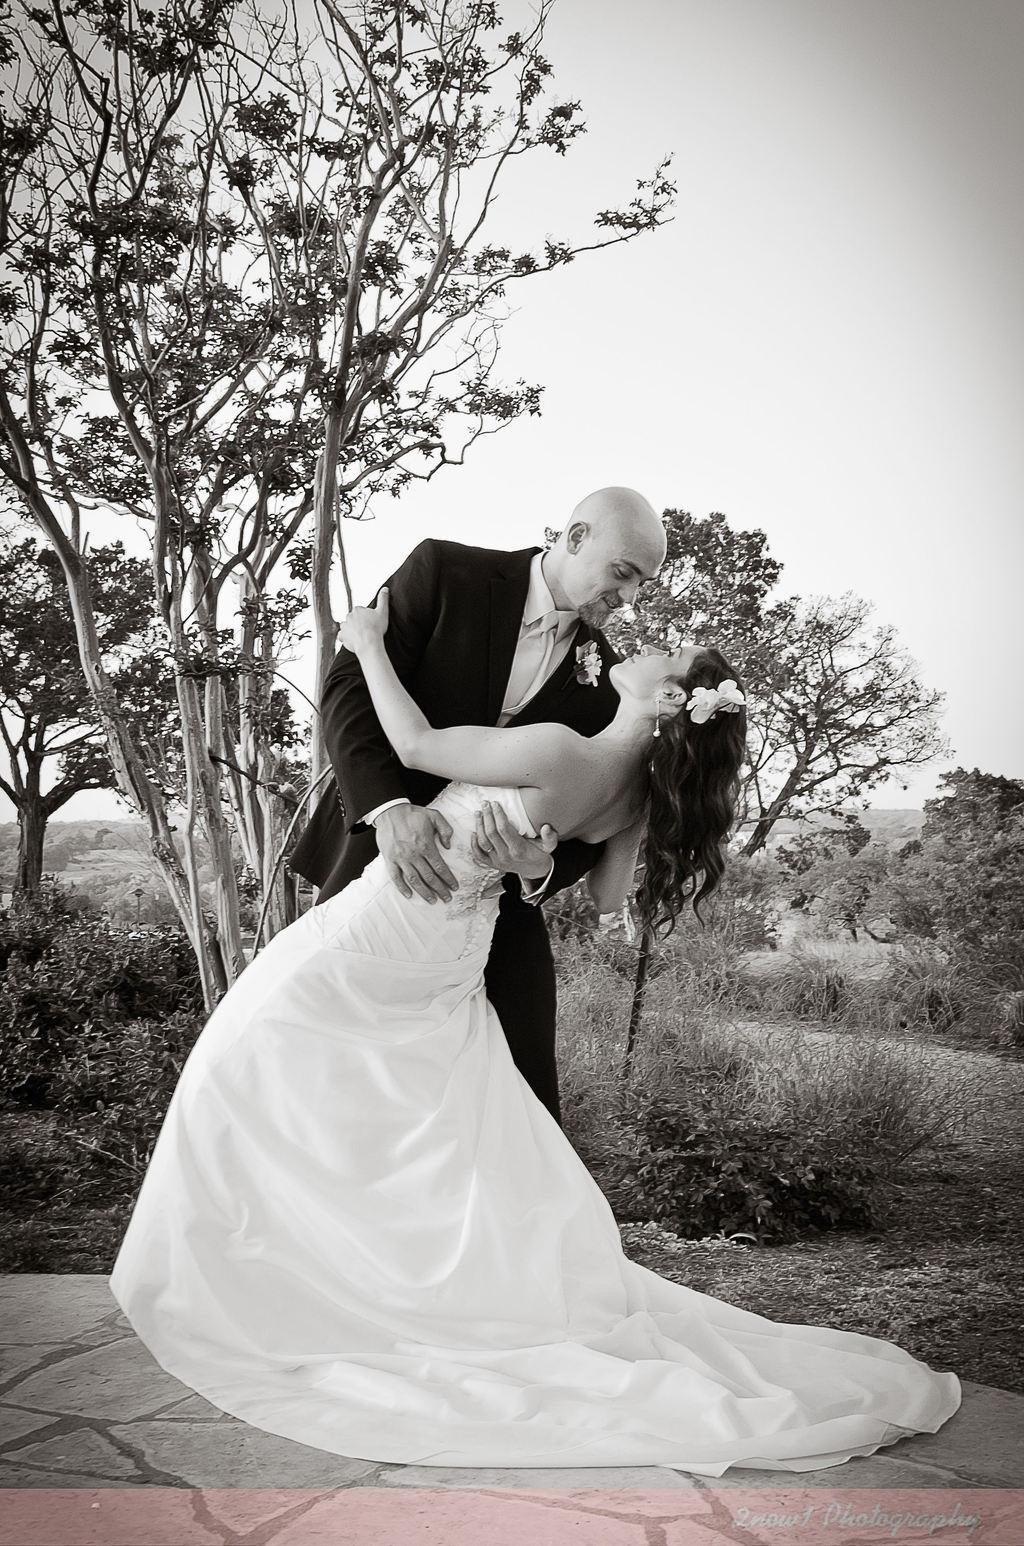 Central_tx_weddings-2now1photo.com-caseyaustin_596.full